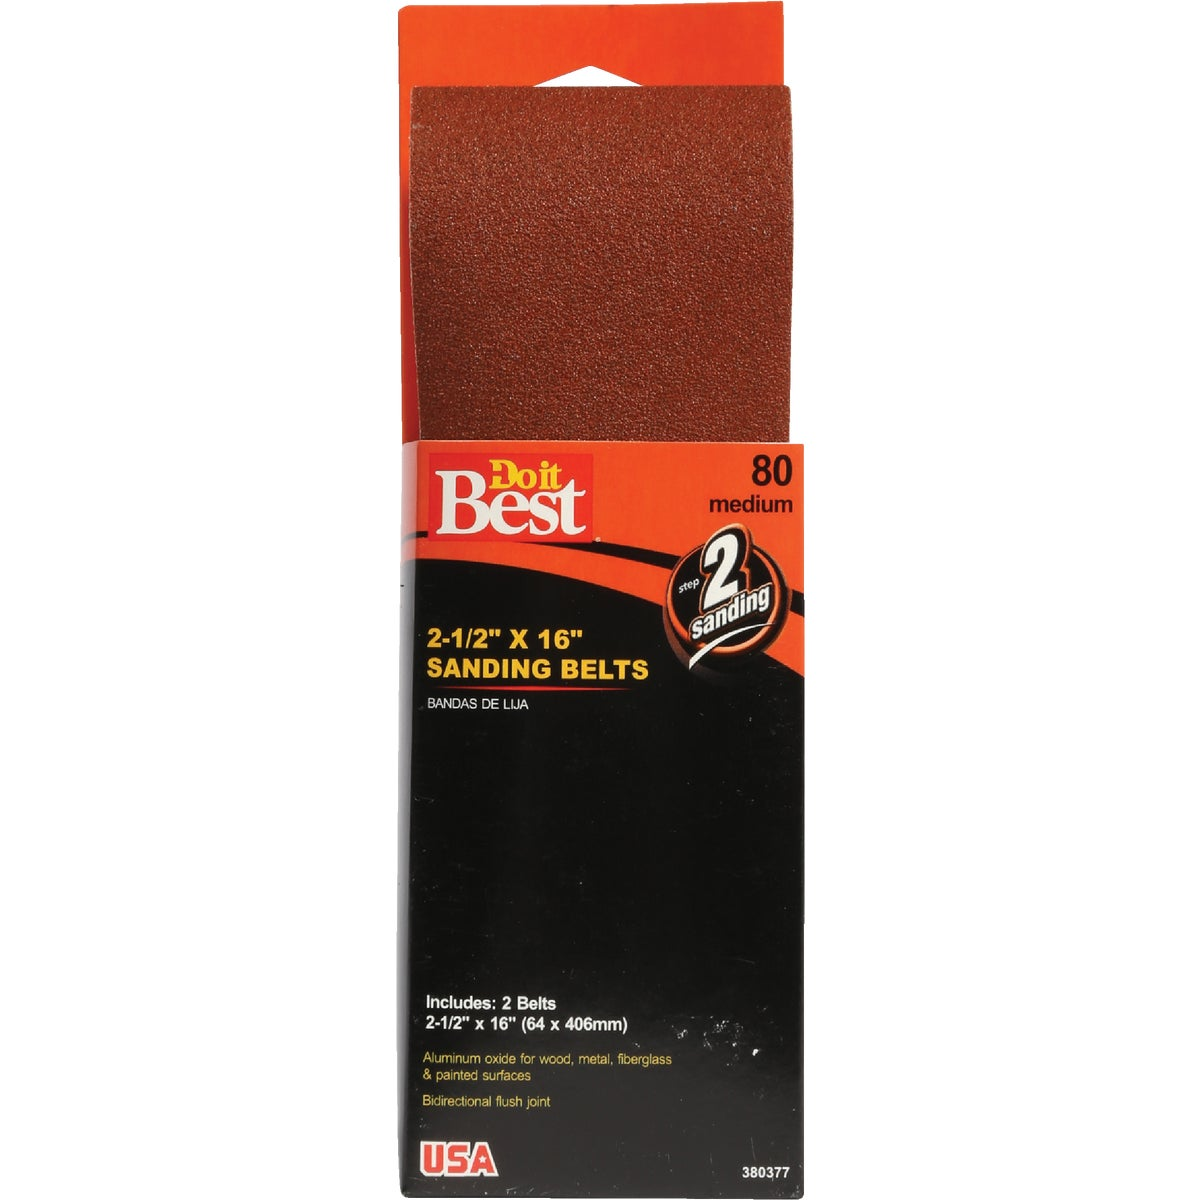 2-1/2X16 80G SAND BELT